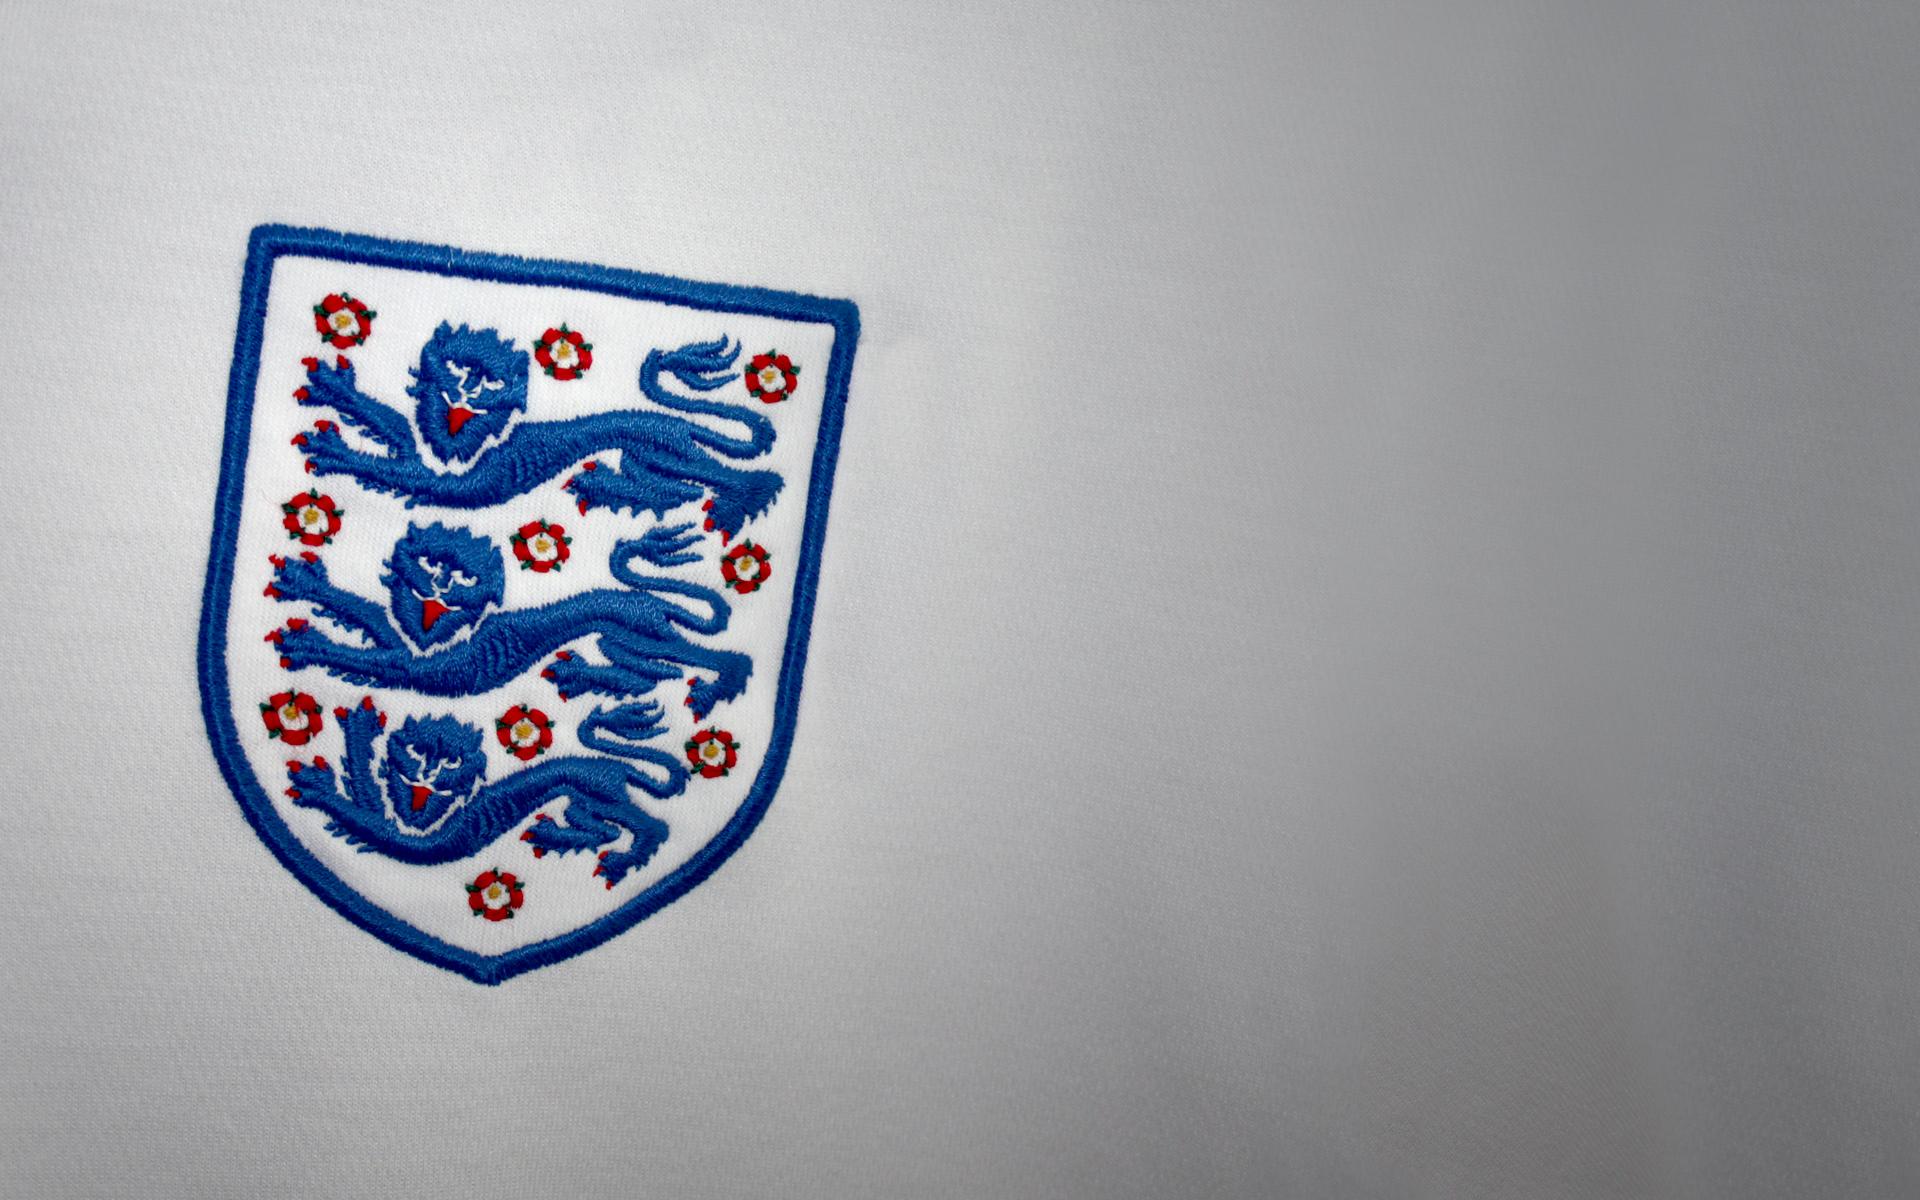 England Football Team Wallpapers Hd Wallpapers 1920x1200